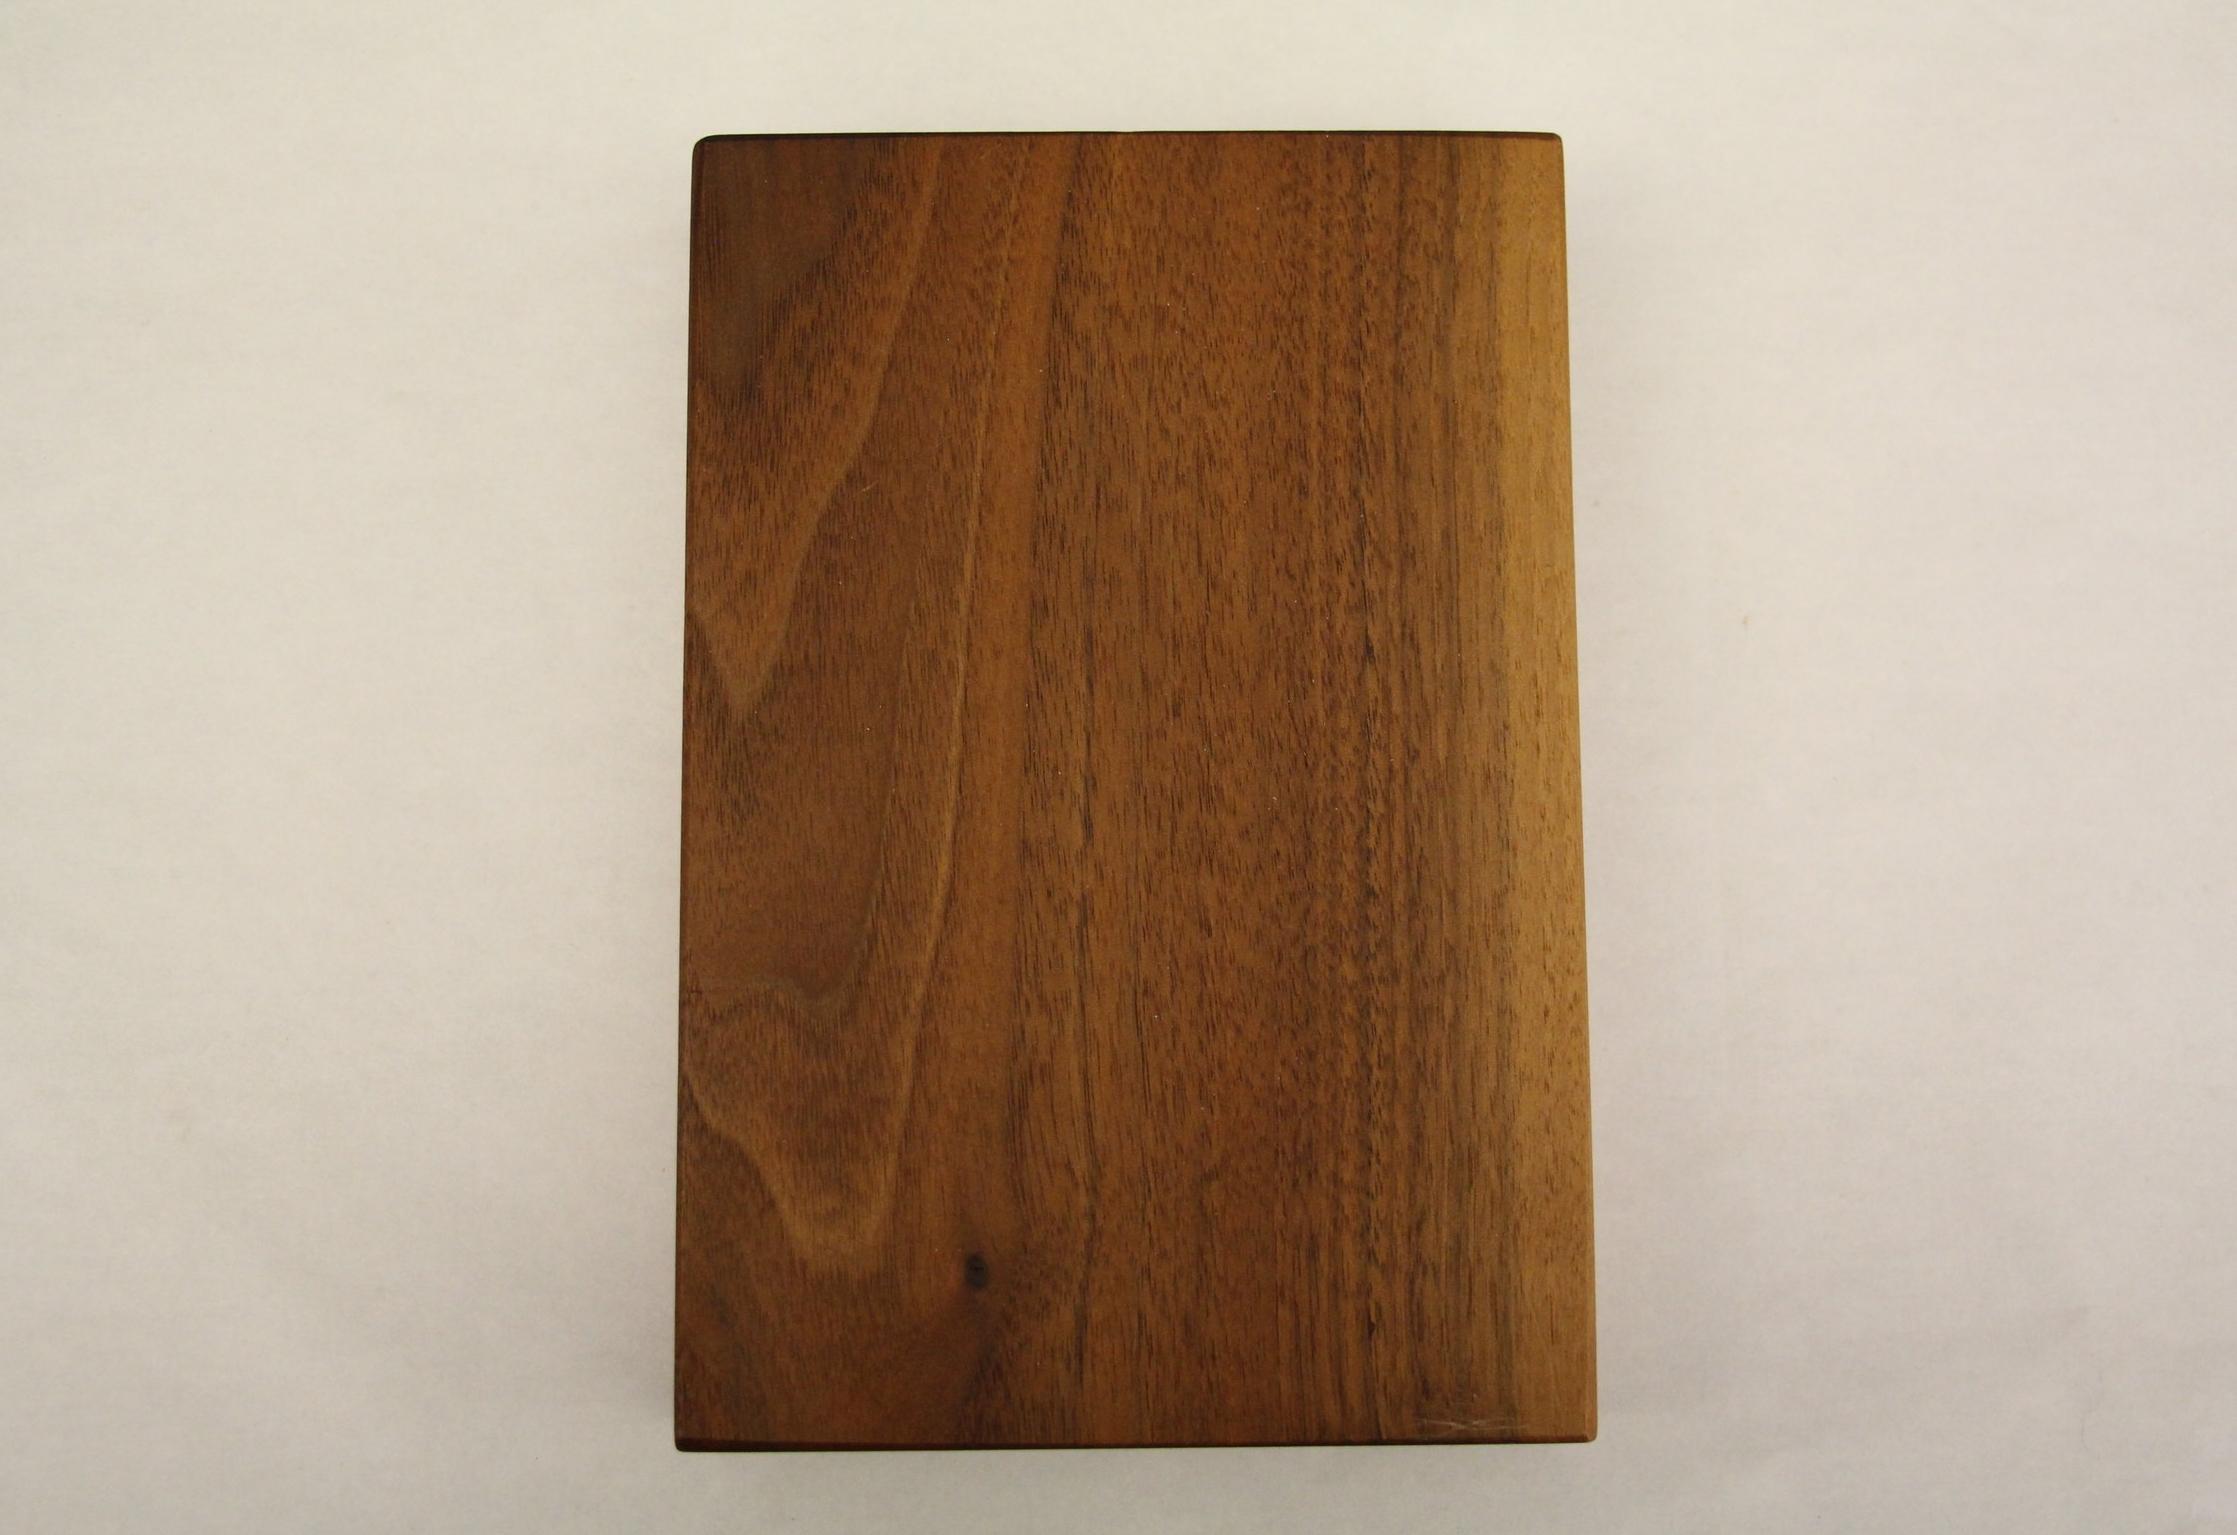 Walnut / slab / natural